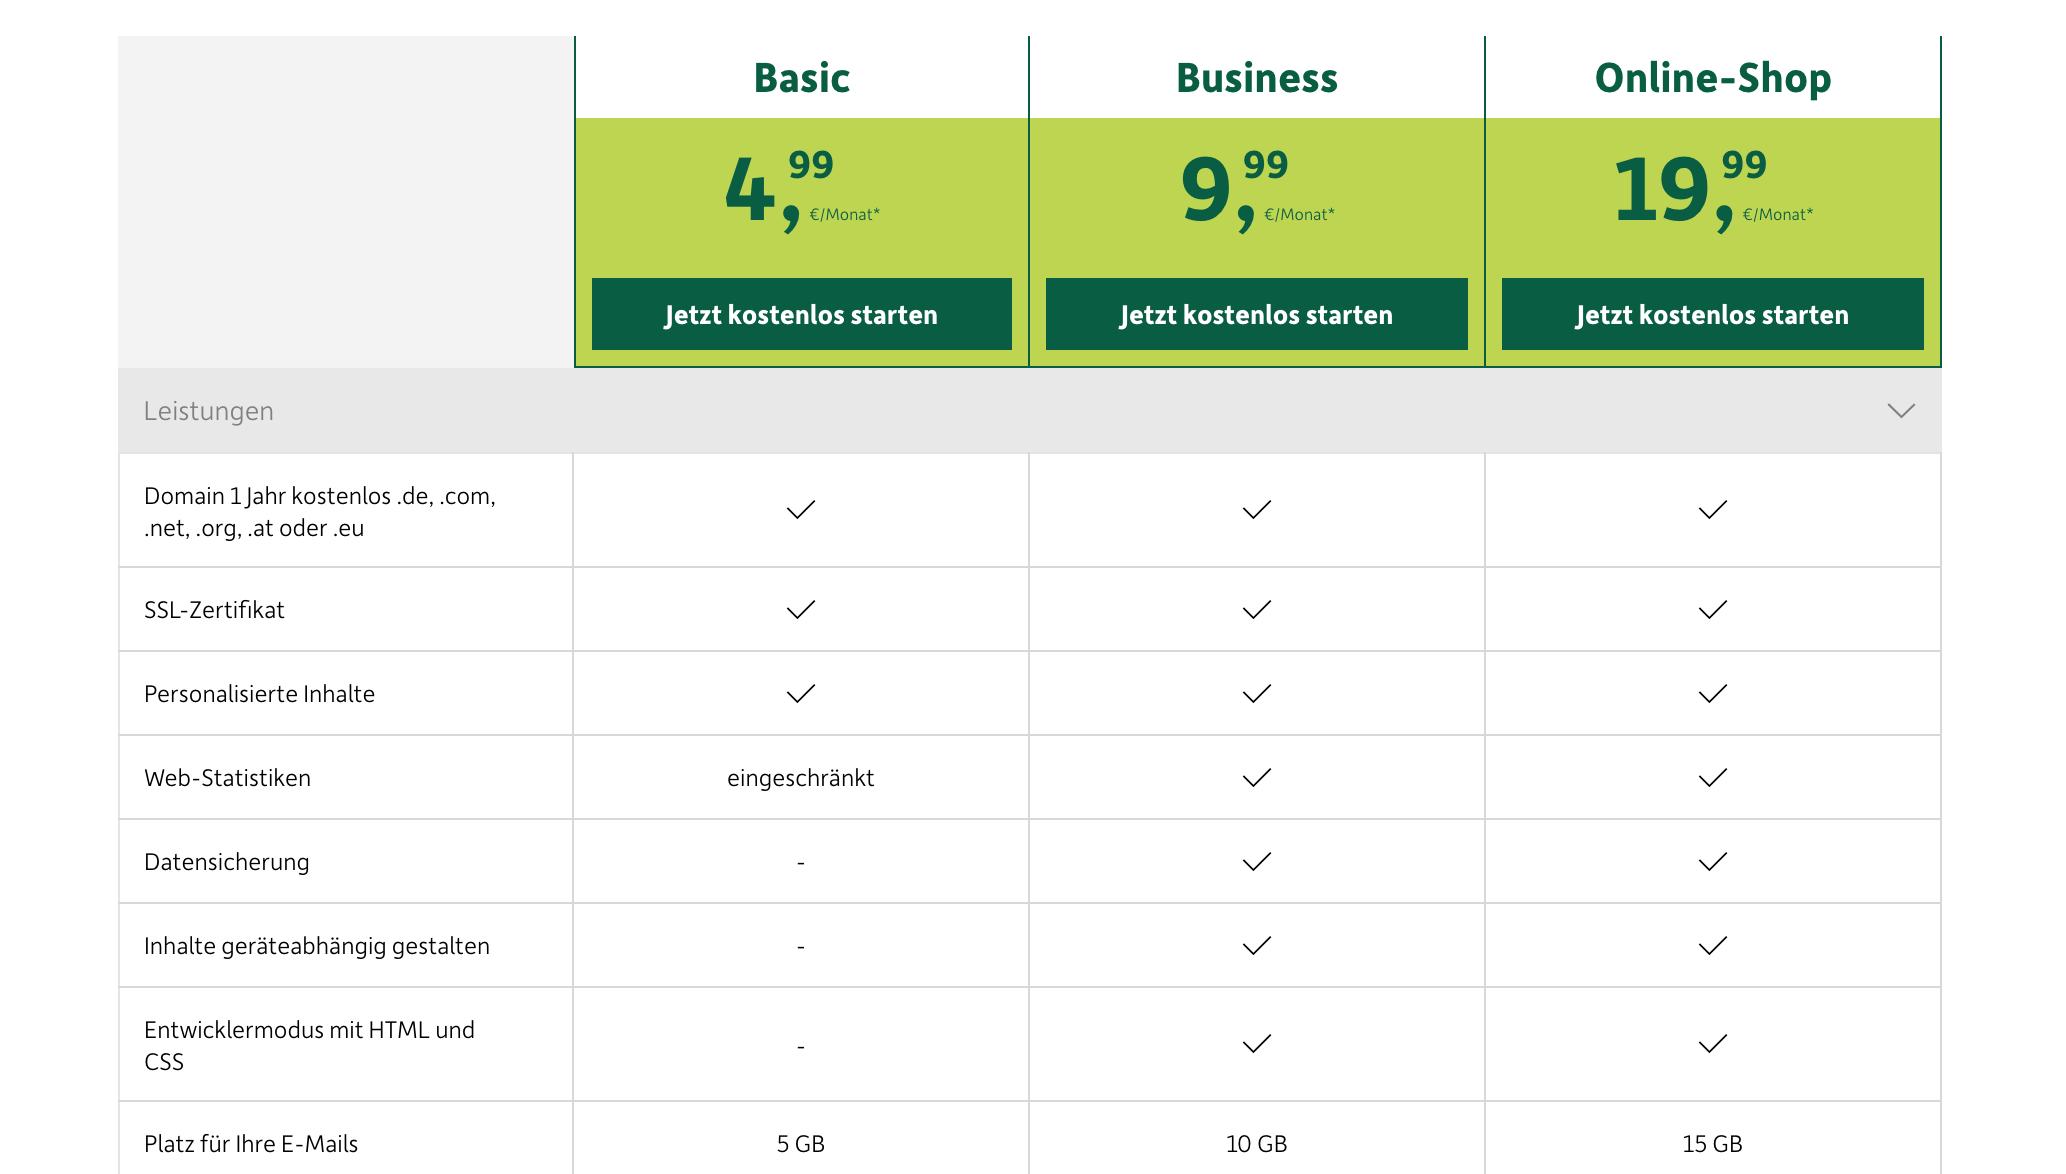 Abbildung über die Domainfactory Tarife